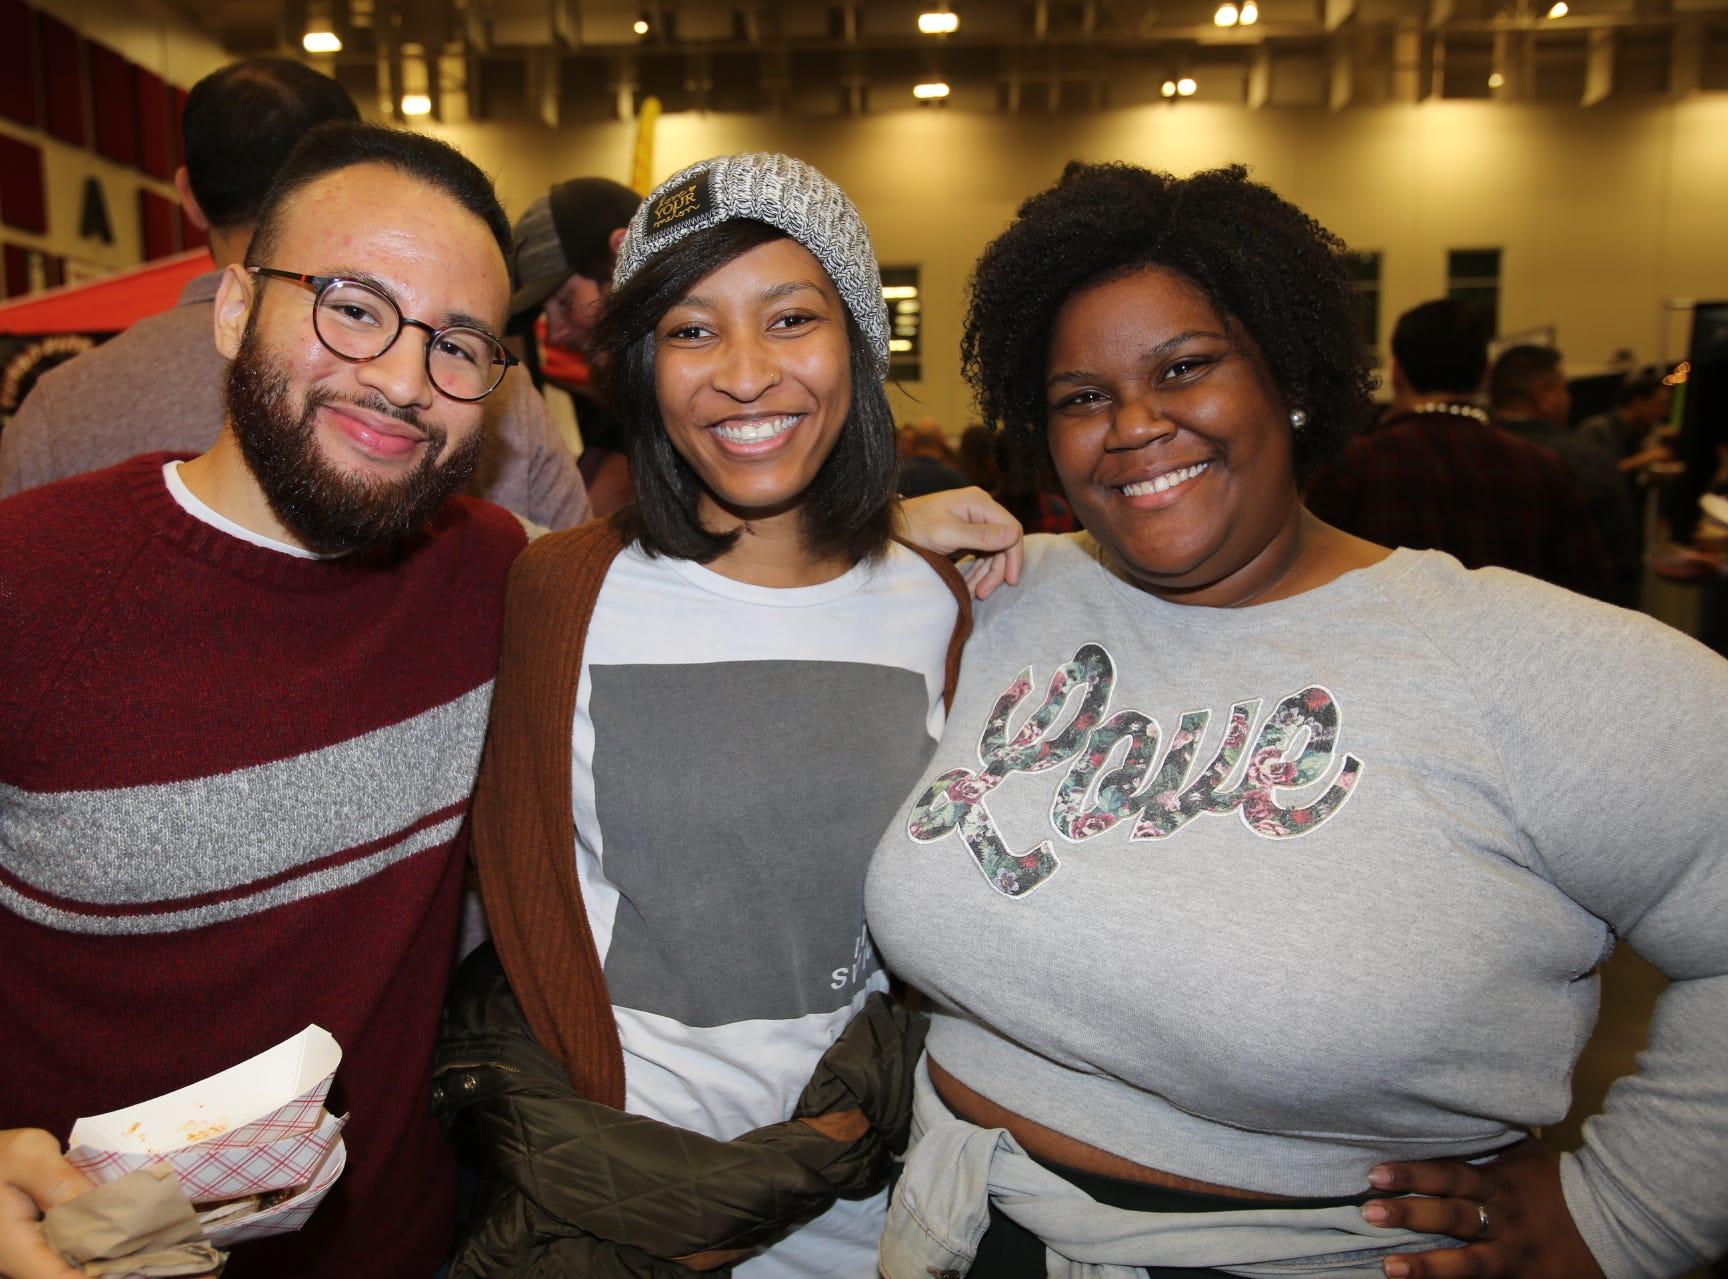 Chris Palma, Michaela Green, and Chelsey McPride